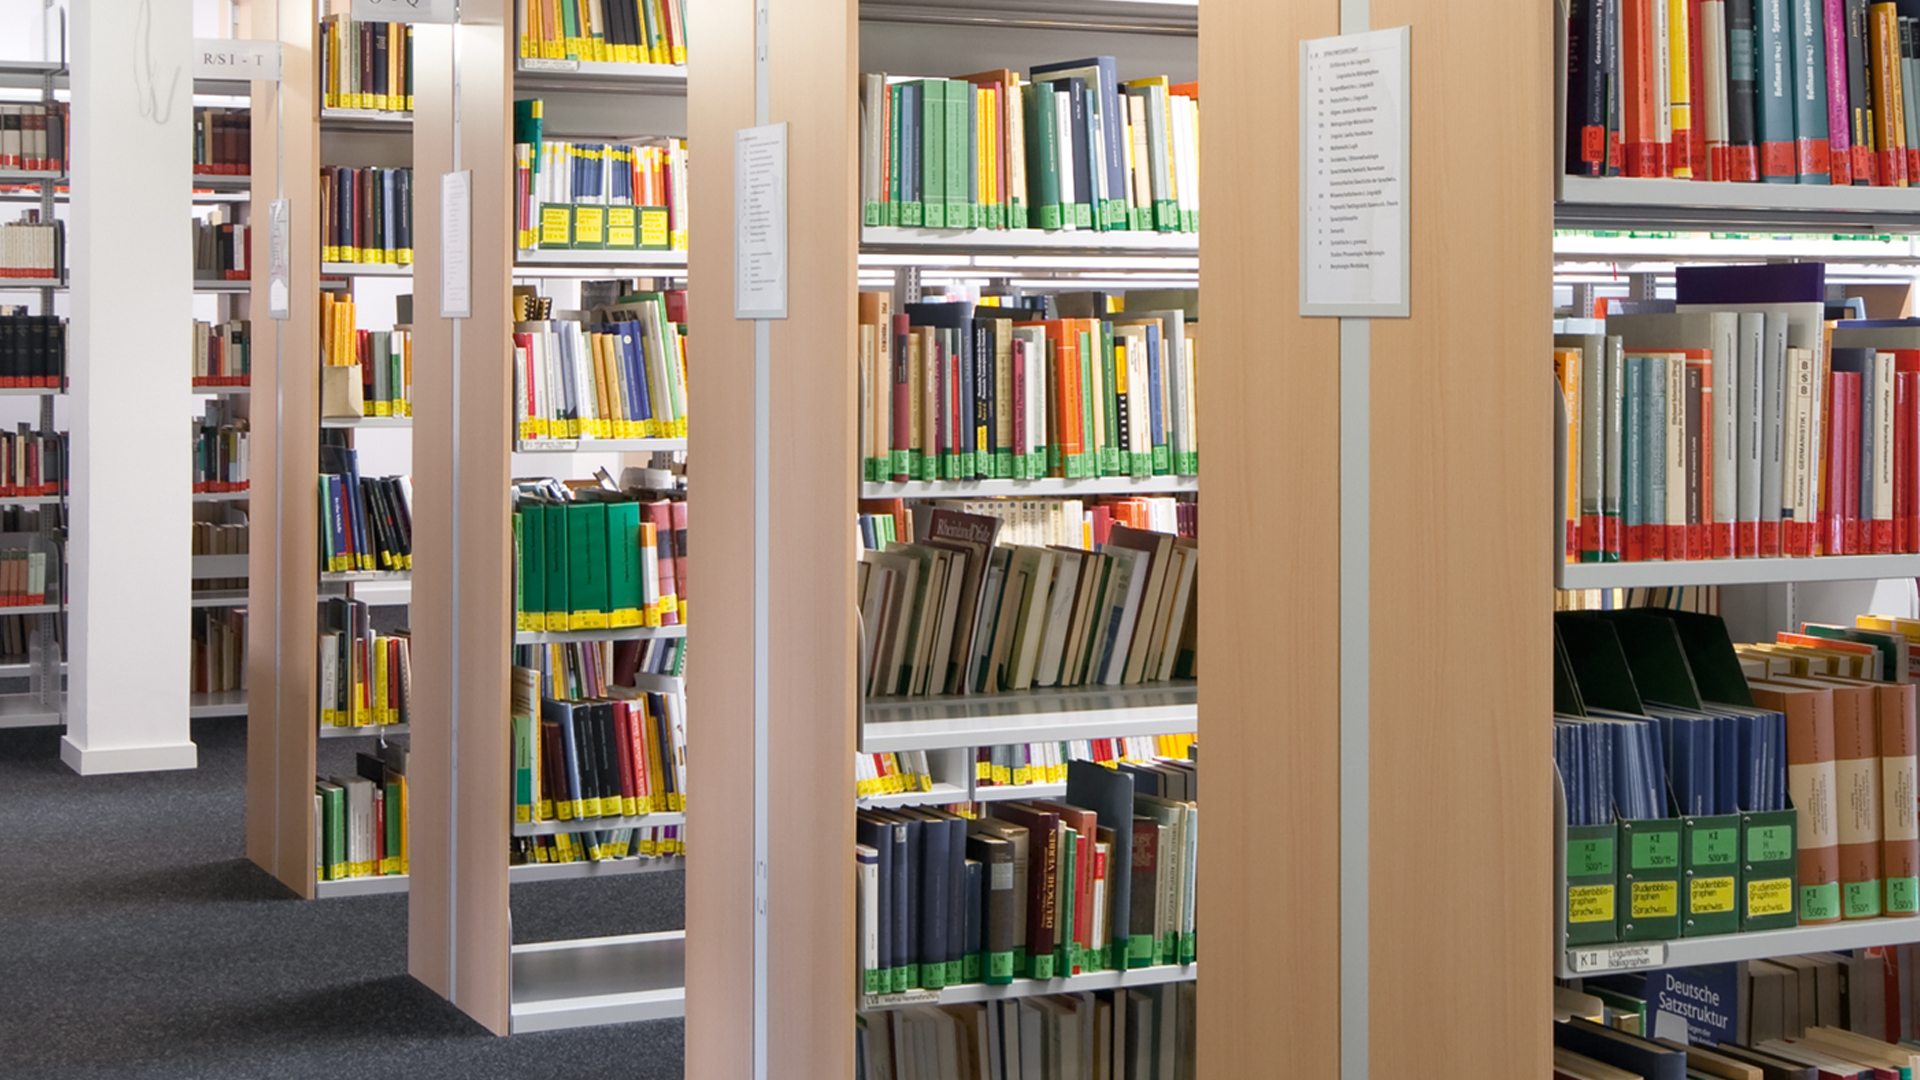 Stationaeres-Freihandregal-Bibliothek-04-BR-mauser-16-9